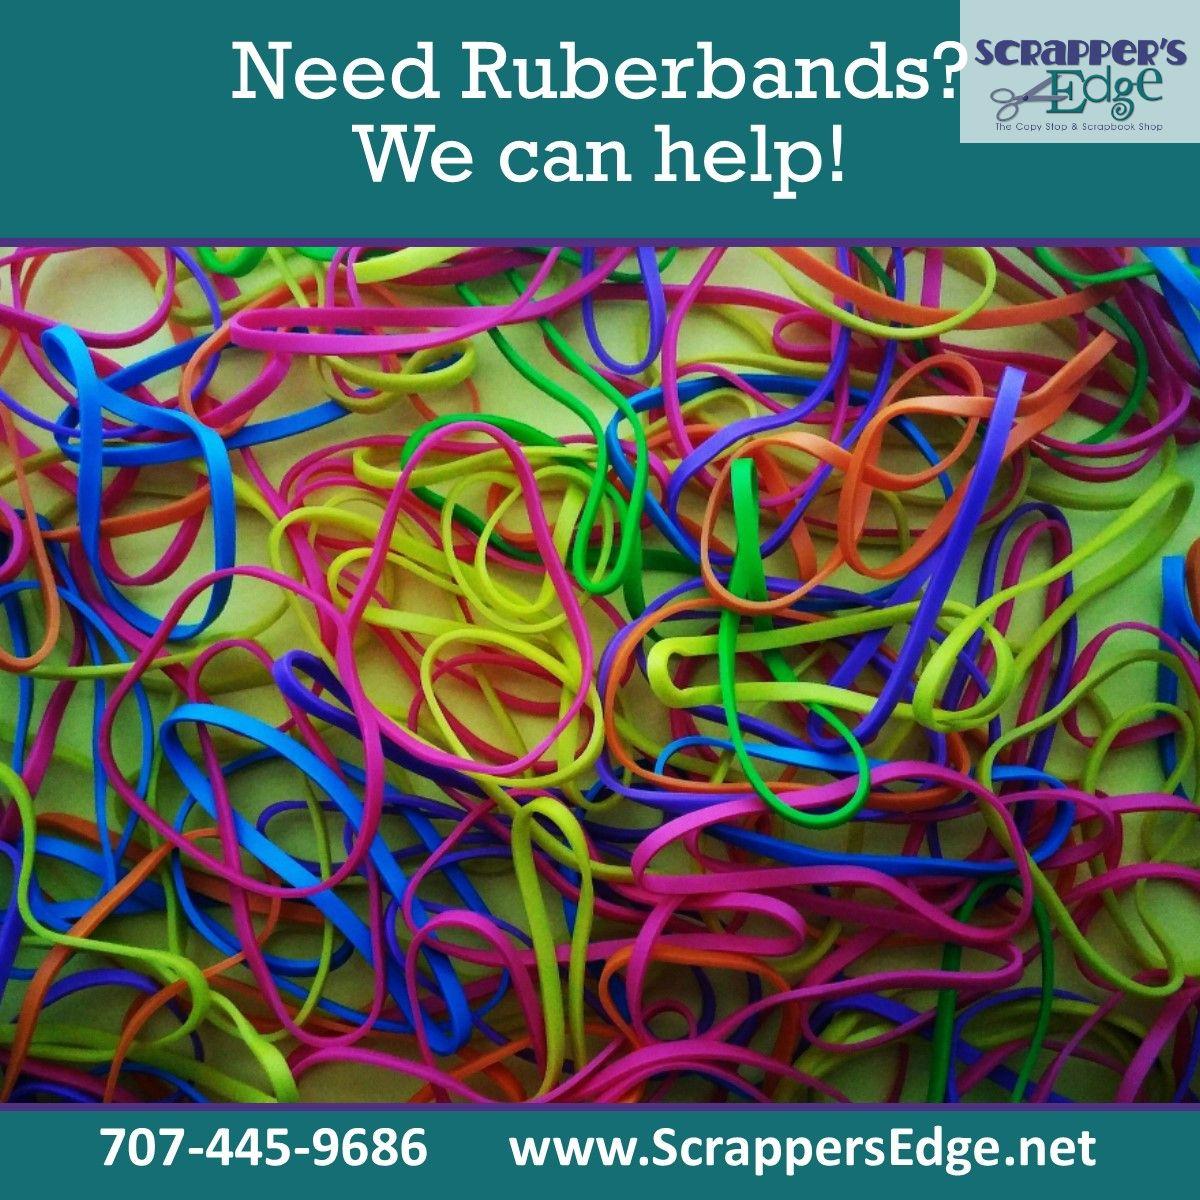 Yes, we even have rubberbands in colors! . Shop in store or online:  . #PaperRelated #ShopLocal #happy #followme #repost #life #amazing #bestoftheday #ScrappersEdge #EurekaCA #BestOfTheNorthcoast #BestOfHumboldt